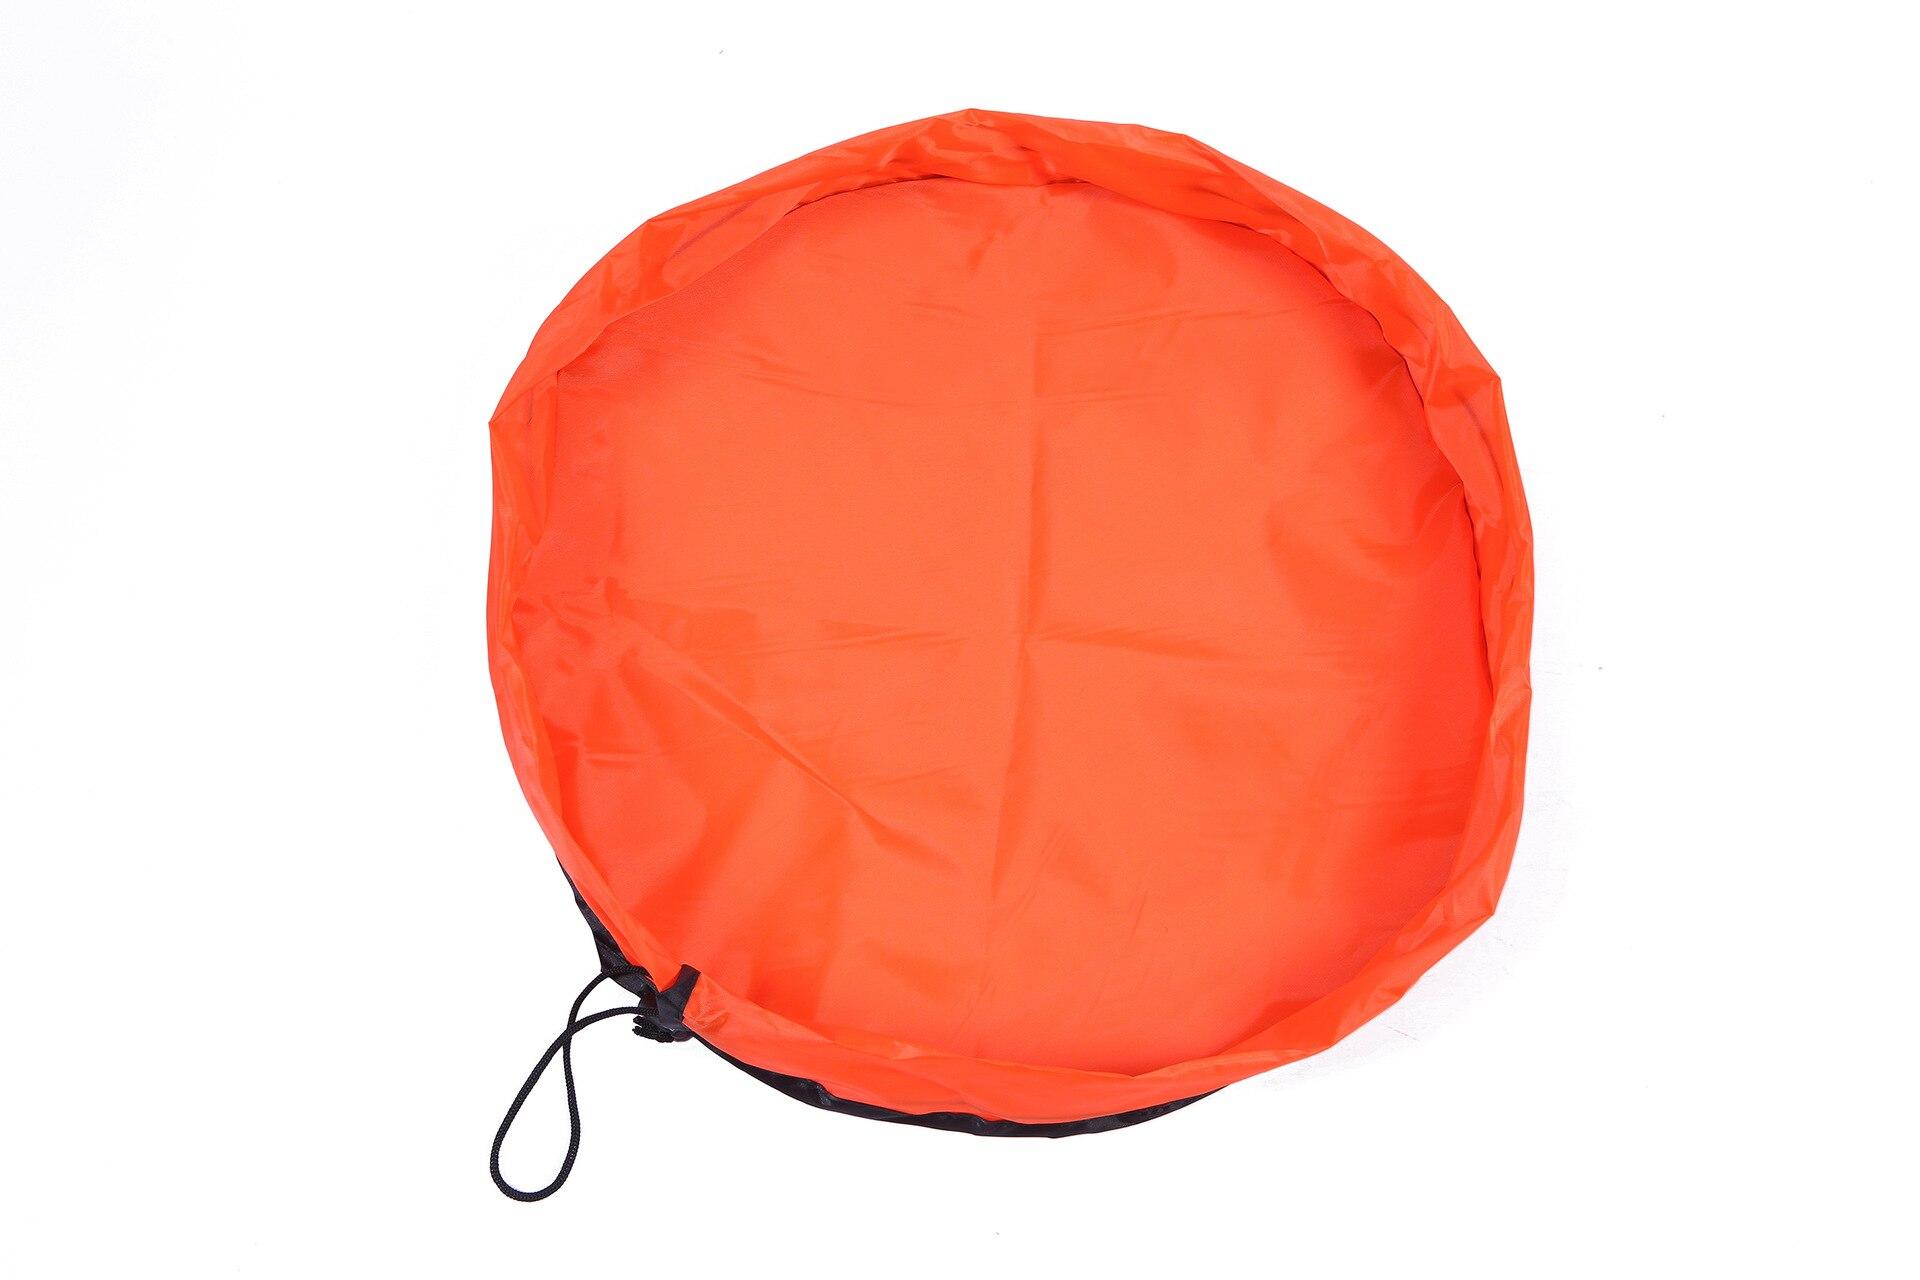 Hd67f0c54f66b4778b77b40b8df348a41s 2020 Multifunctional baby toy fast storage bag play mat outdoor children's waterproof toy mat beam storage bag beach mat